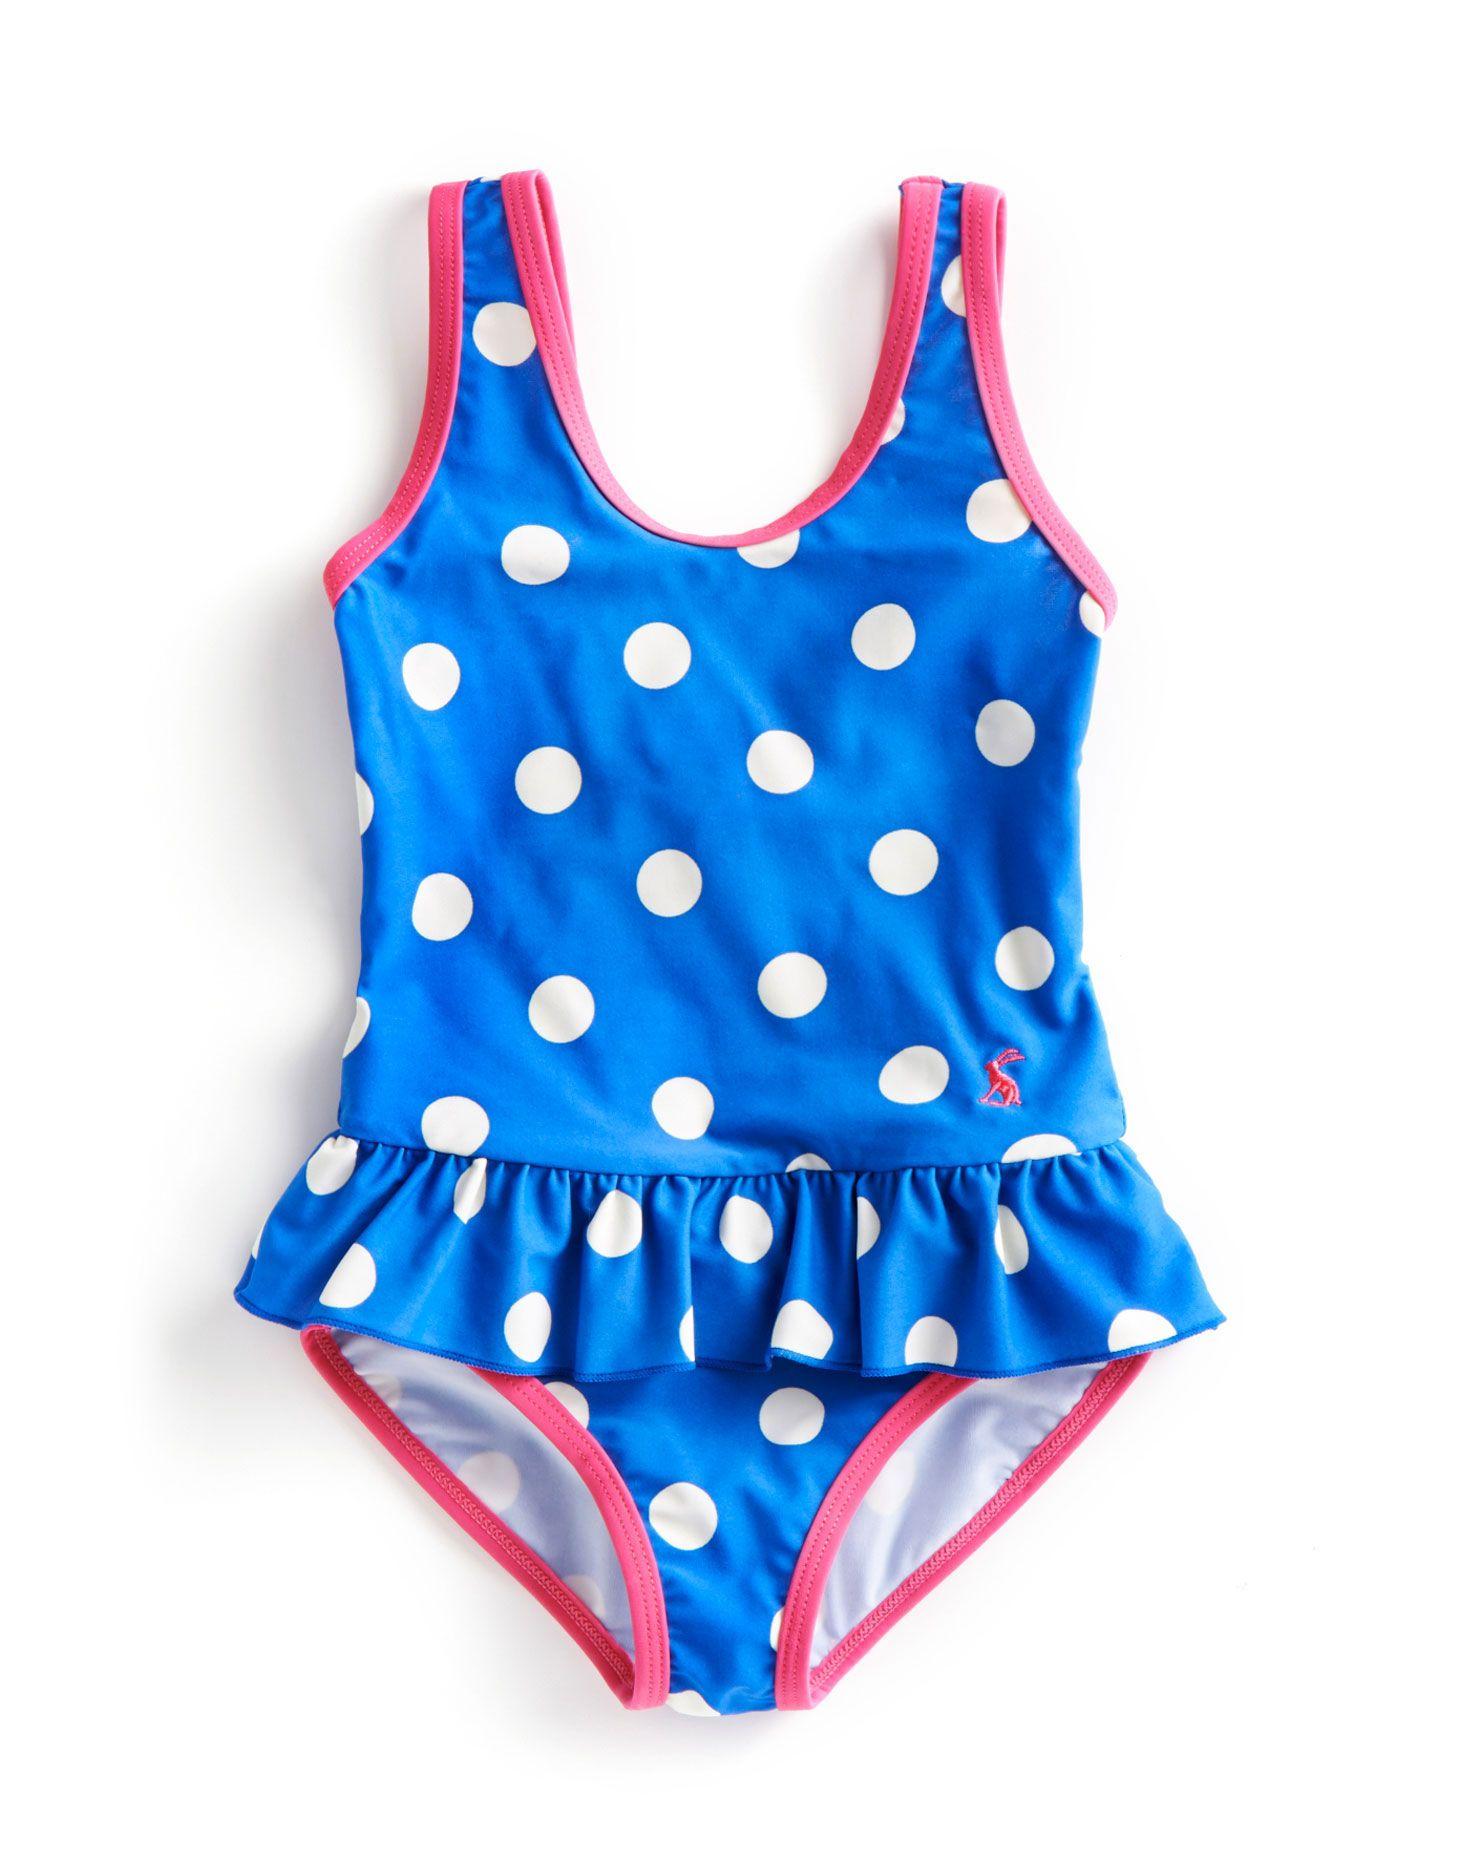 e0d3babbc9 JNR SANDY Girls Swimming Costume-JOULES SS13 | kid fashion | Girls ...